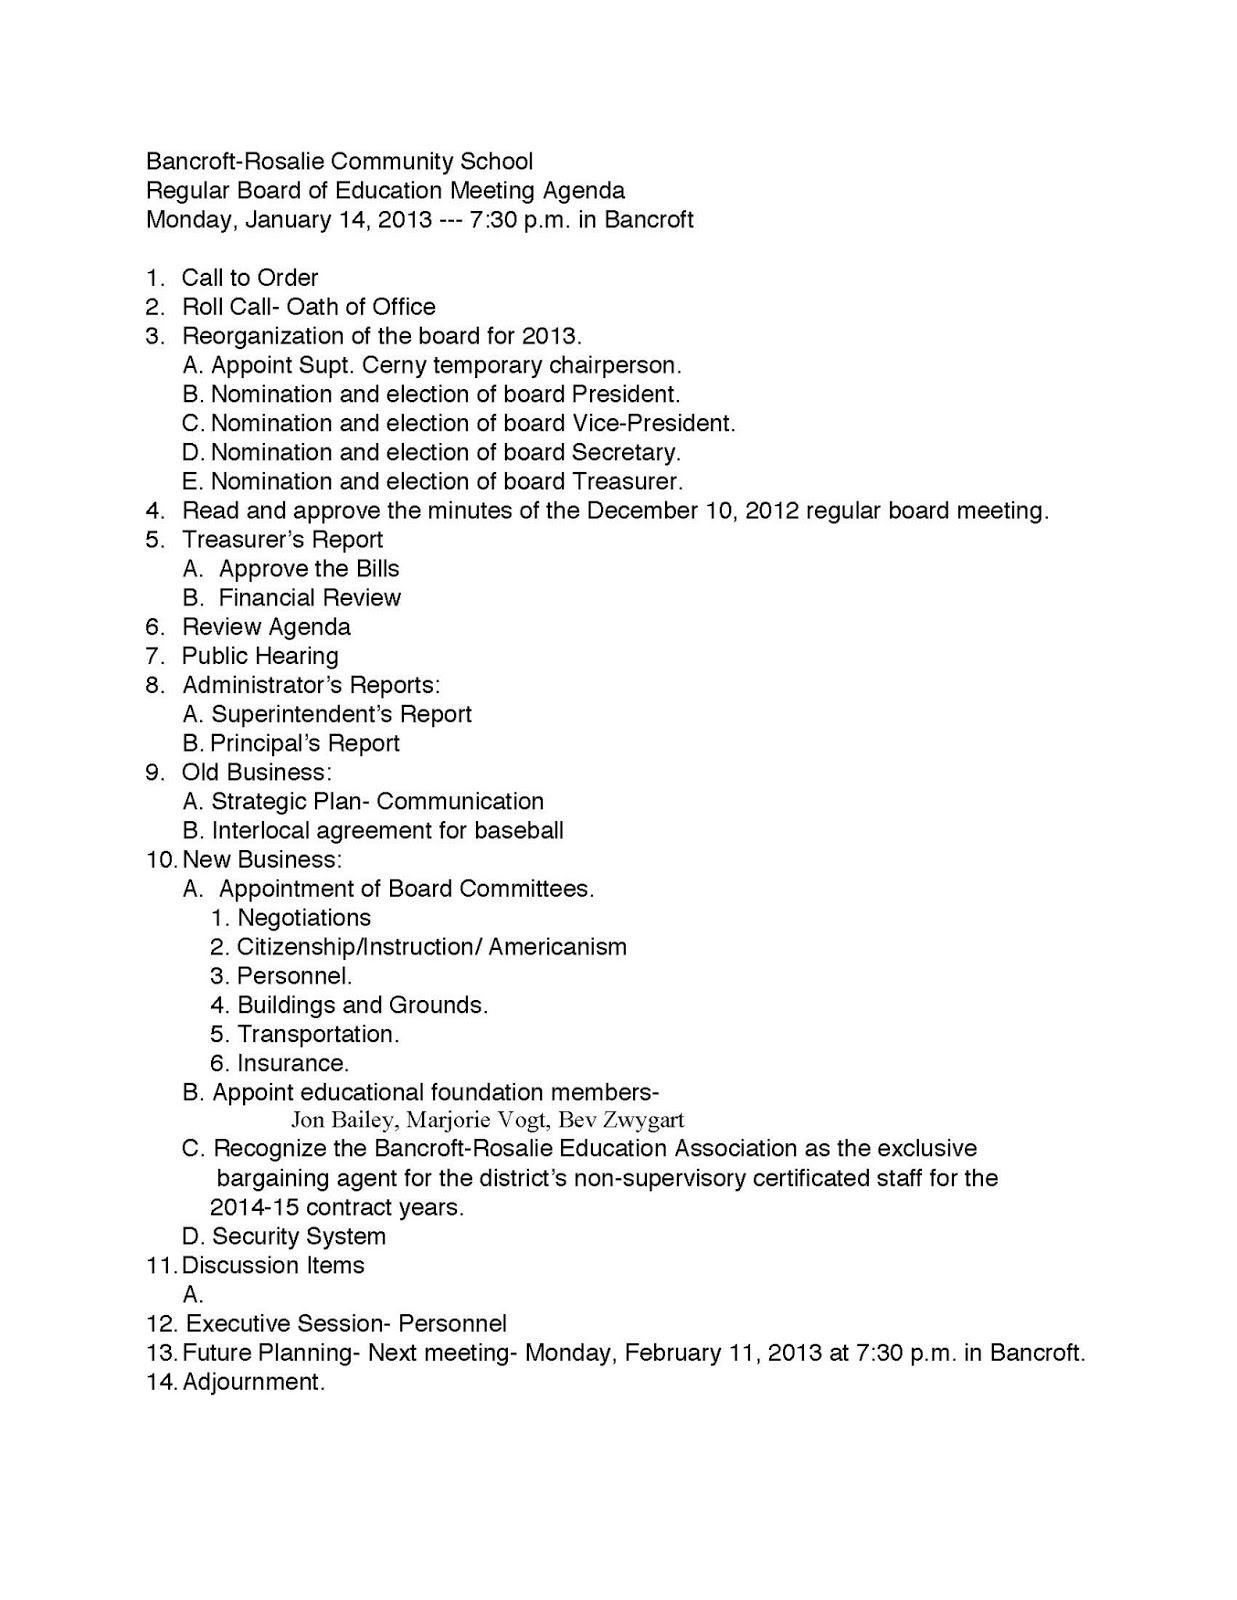 Communication major resume objective